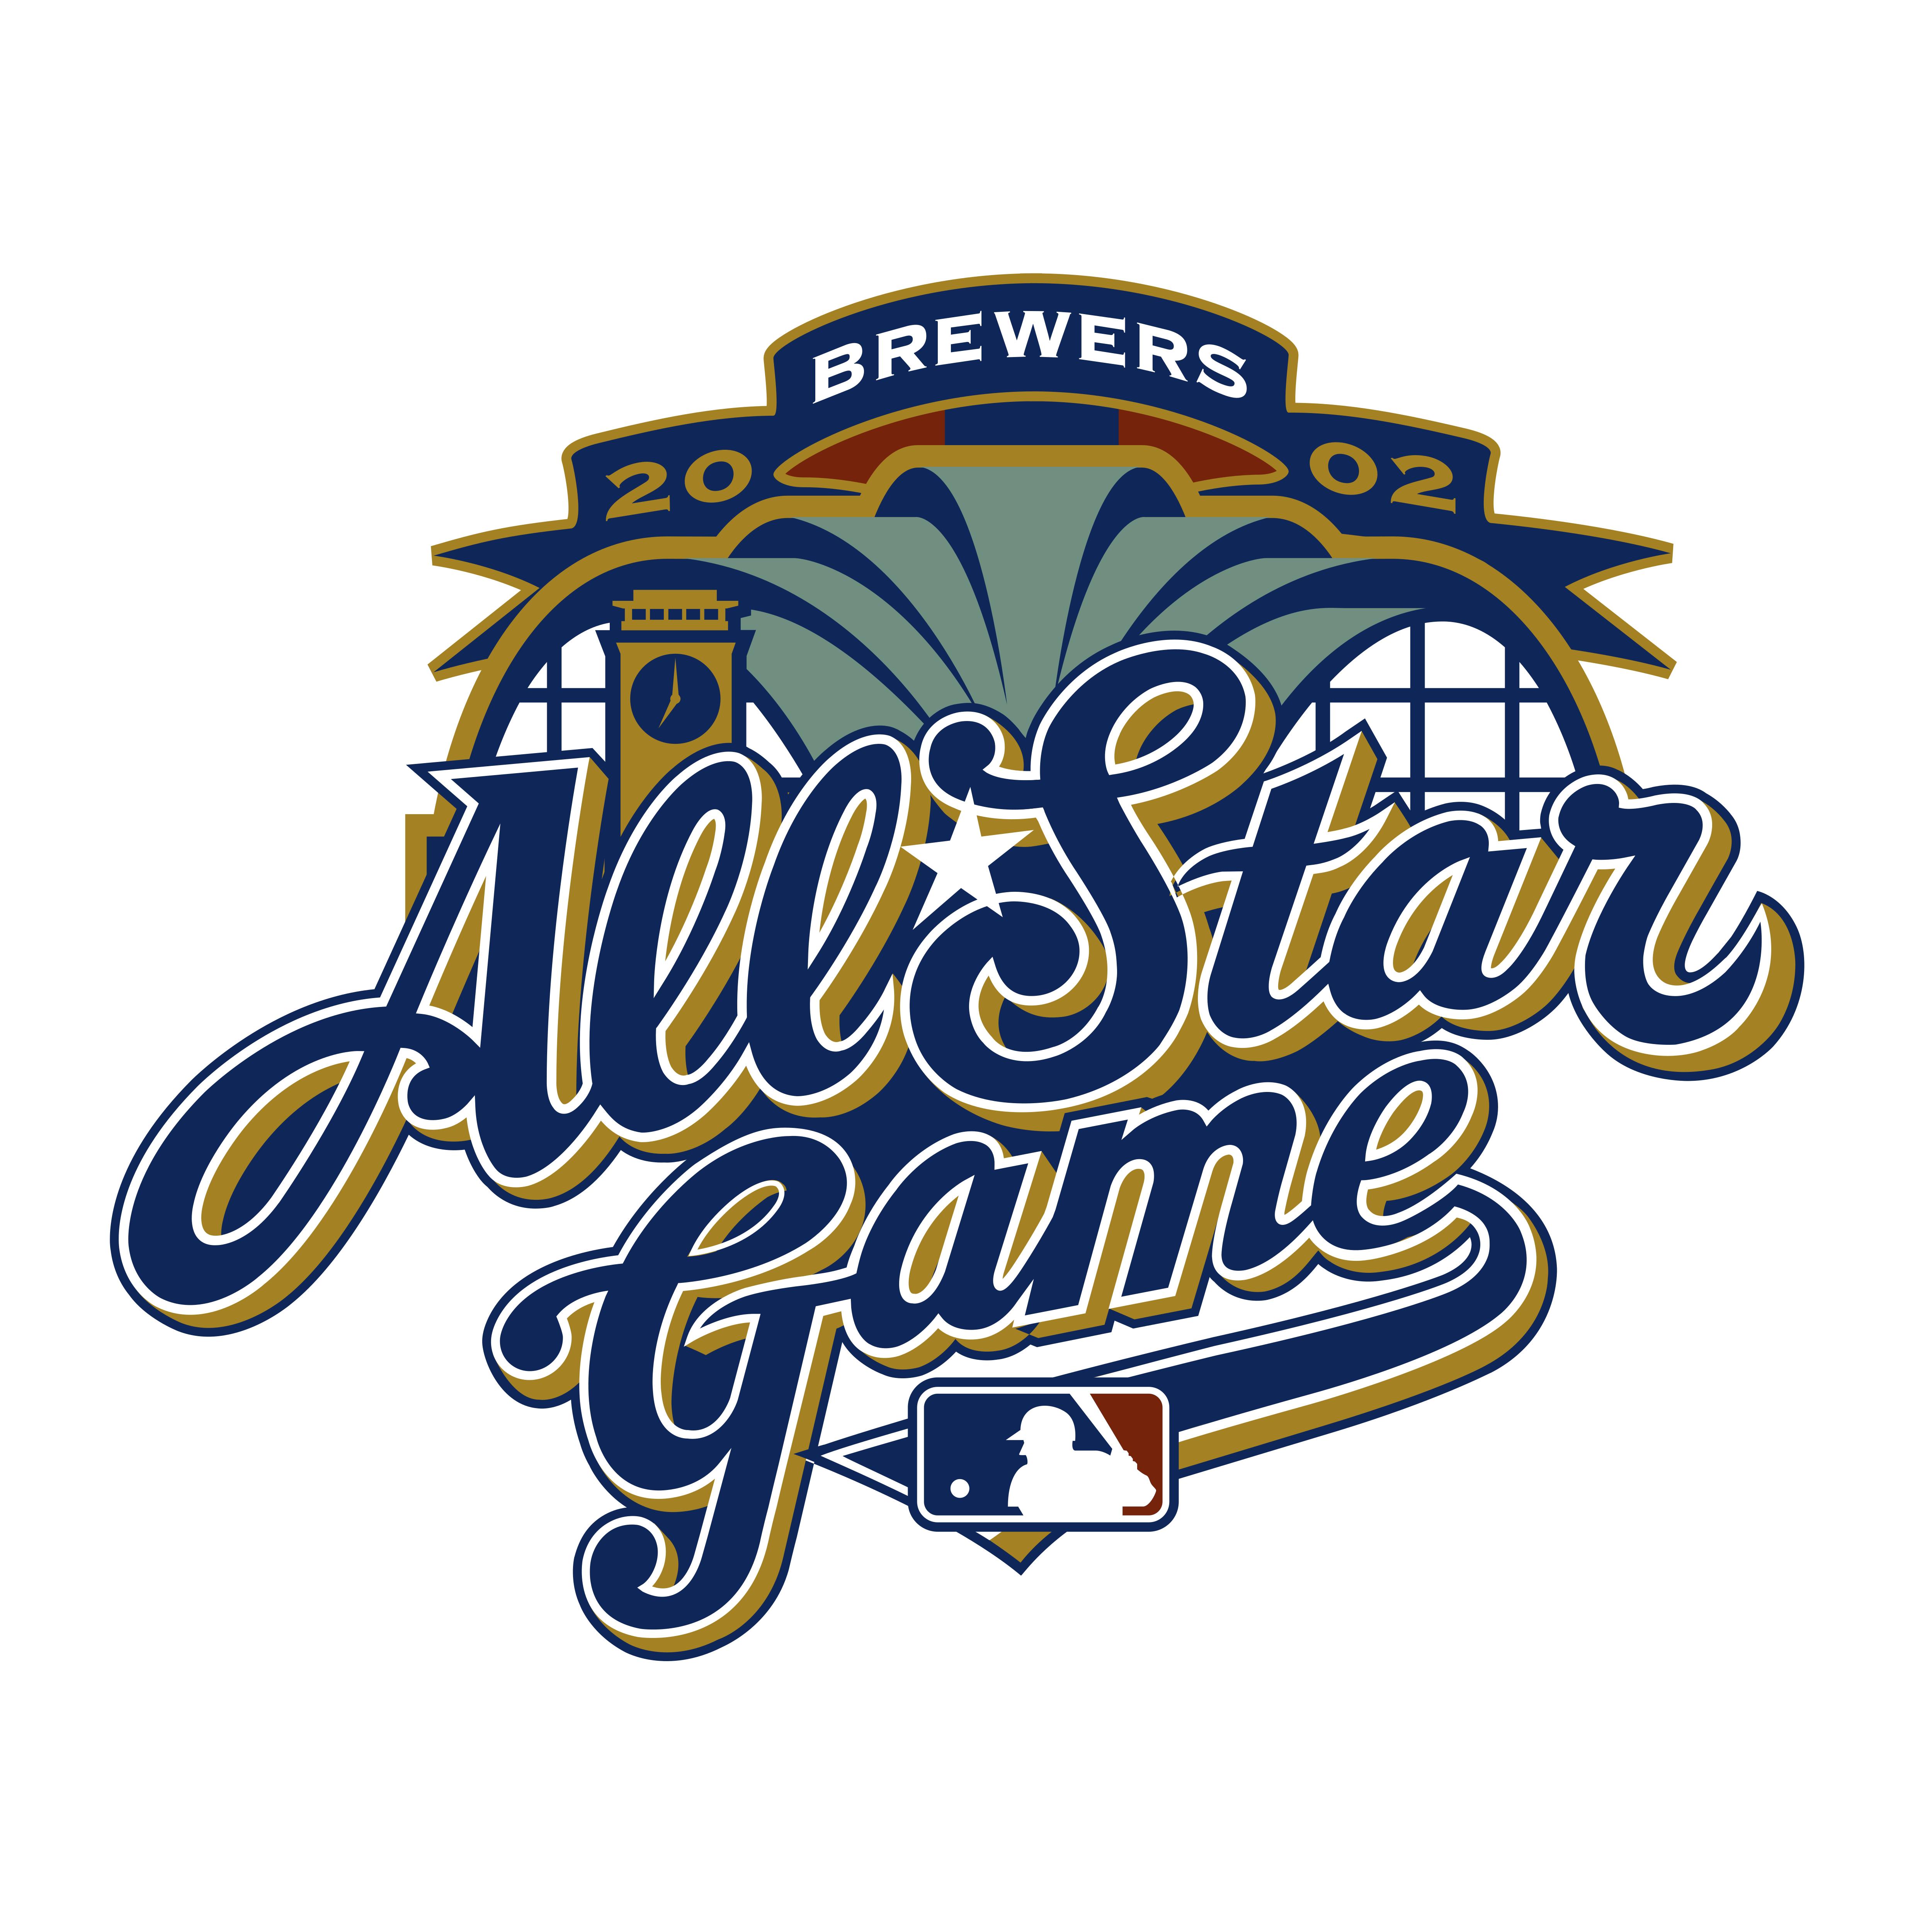 All Star Game – Logos Download